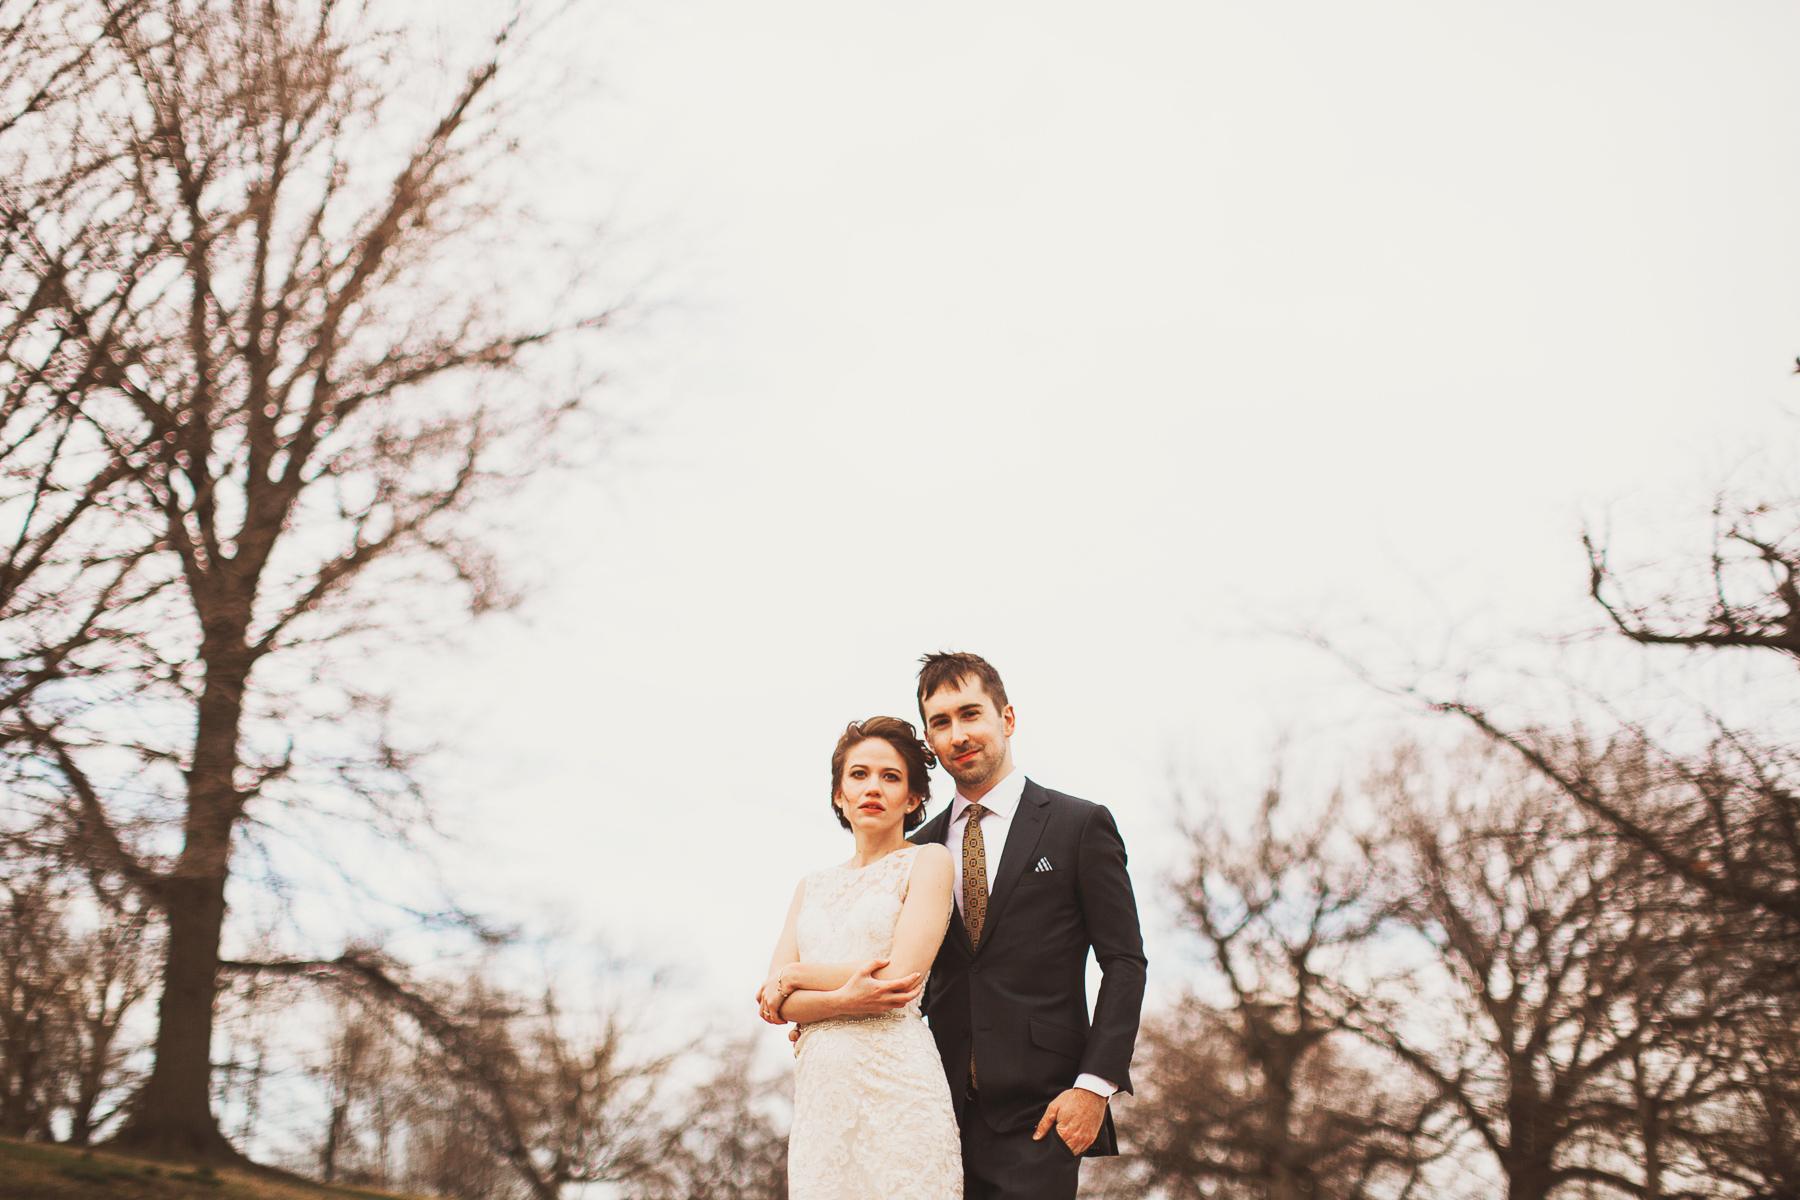 nessa wedding photography